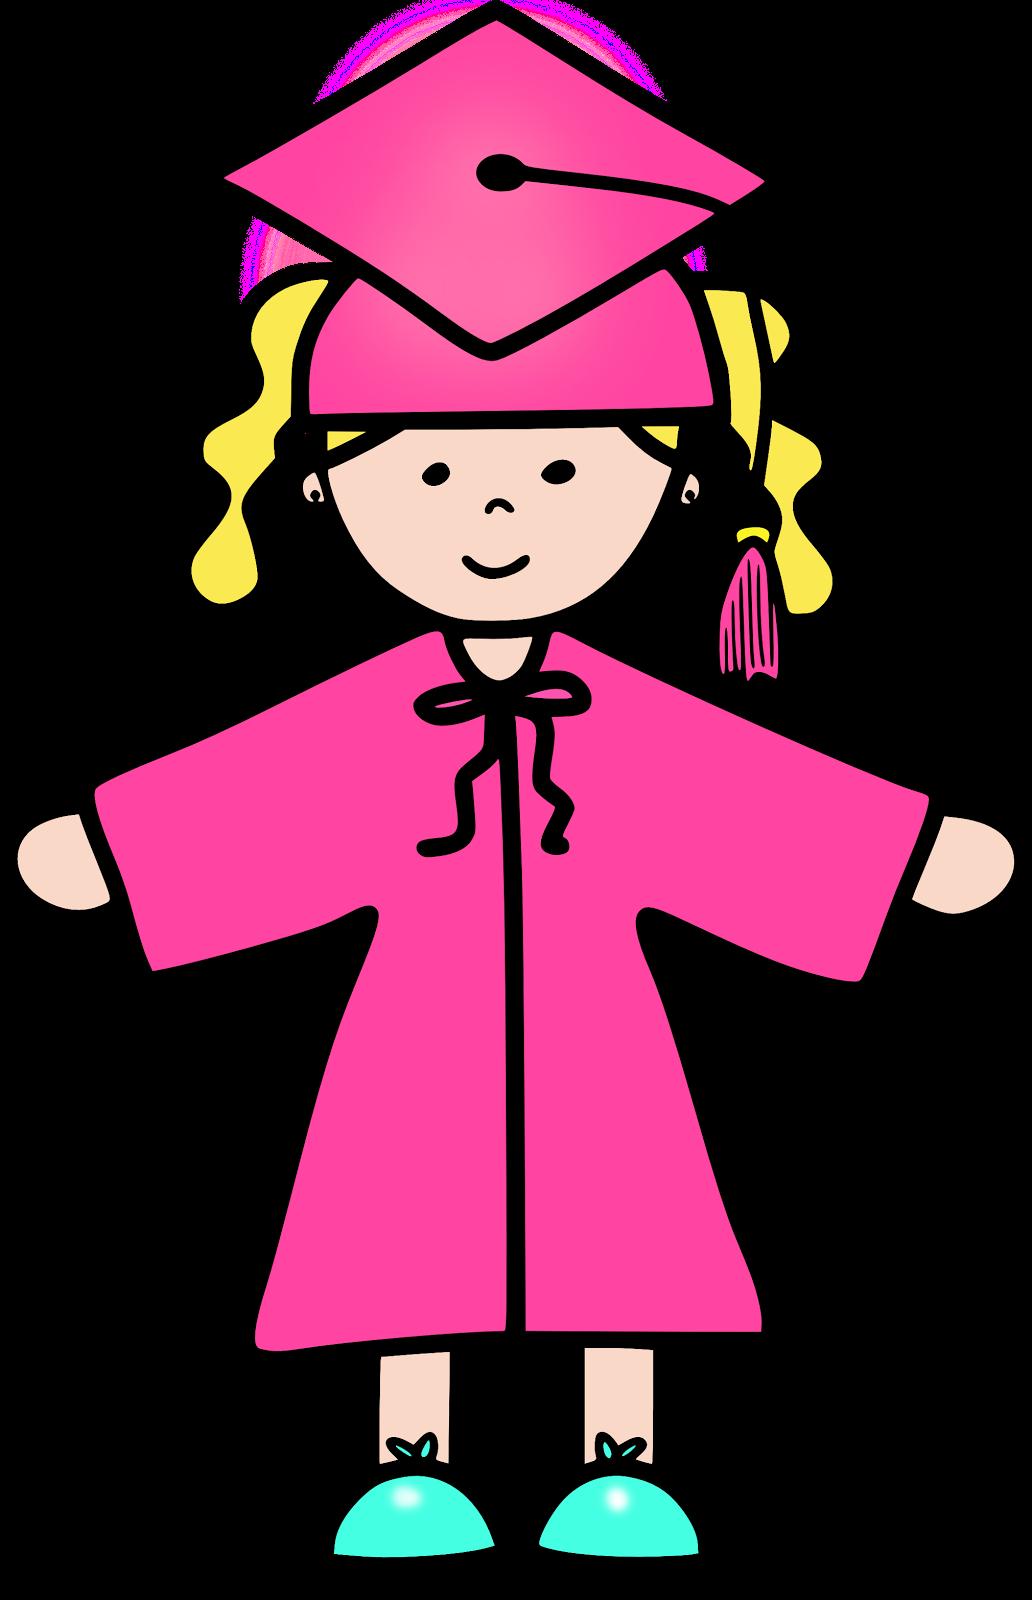 clip transparent library Graduation pink free on. Grad clipart preschool